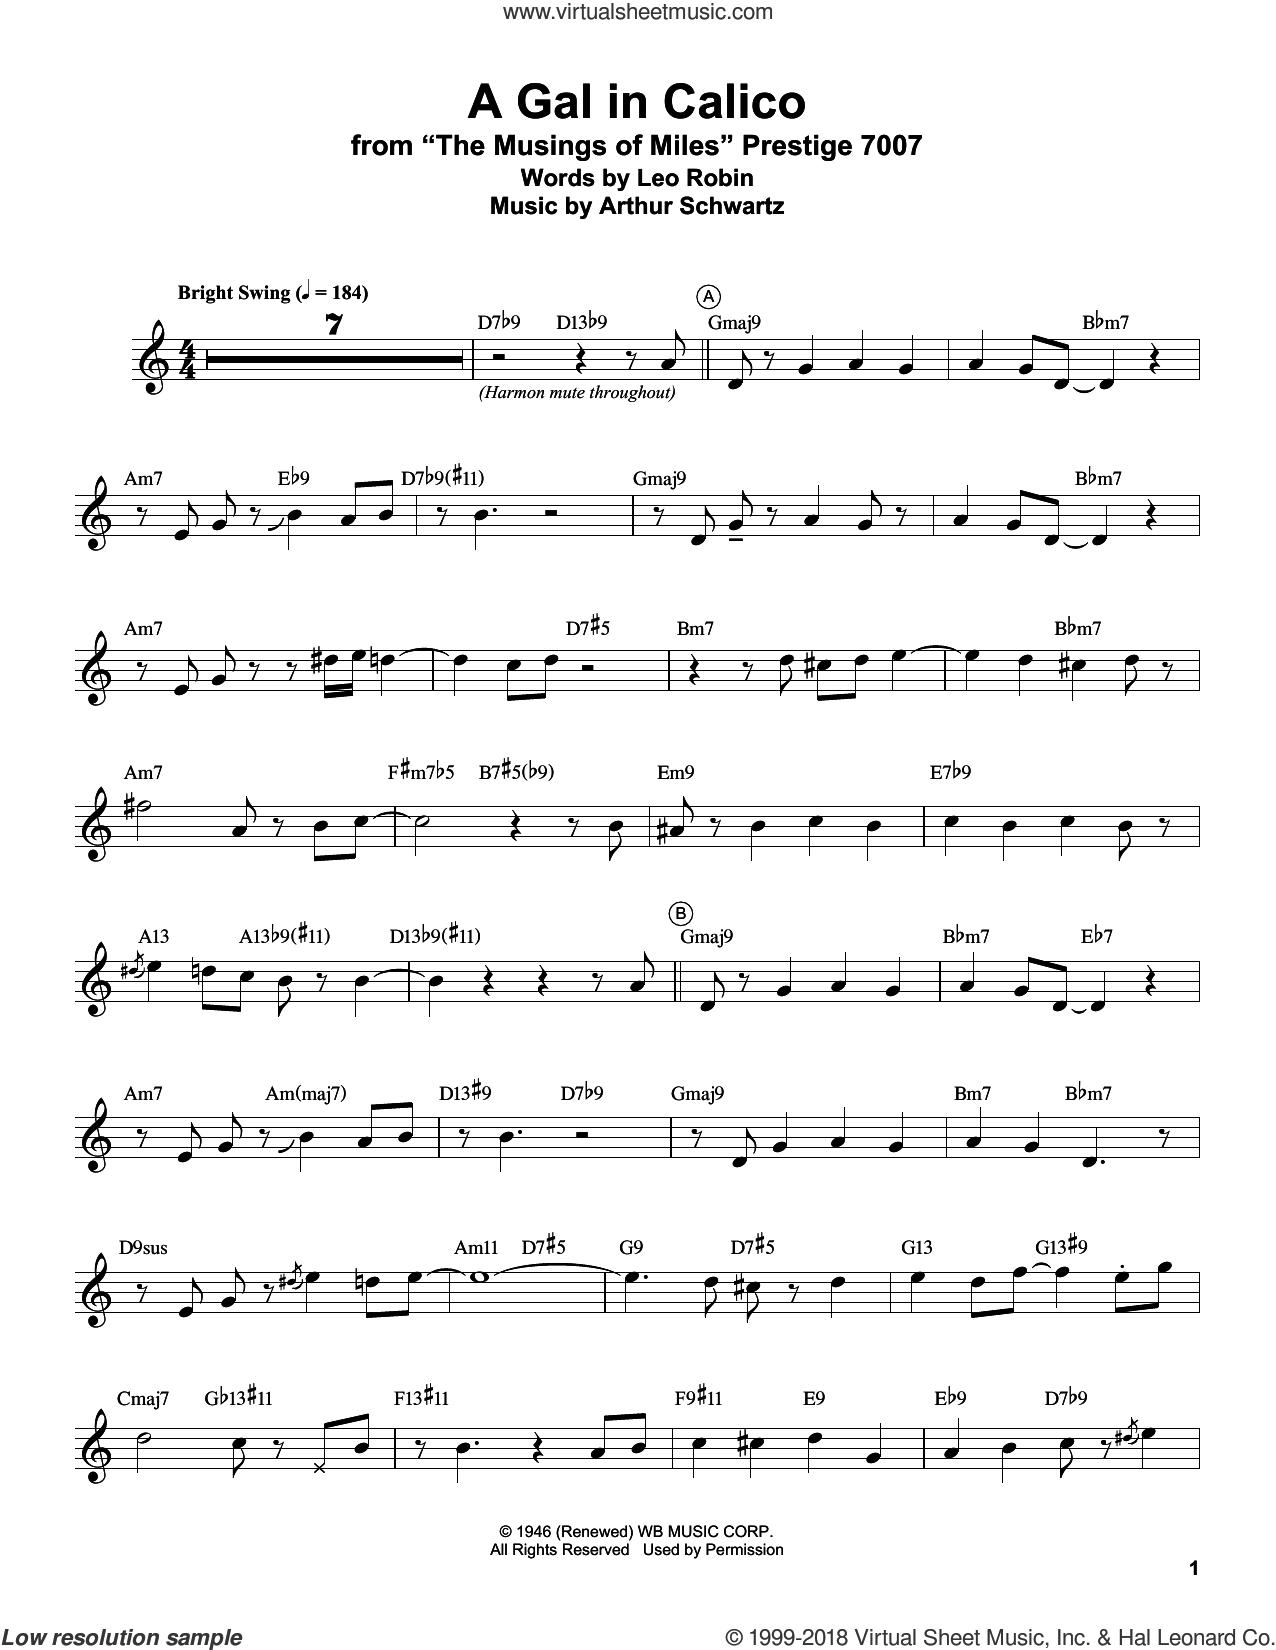 A Gal In Calico sheet music for trumpet solo (transcription) by Miles Davis, Arthur Schwartz and Leo Robin, intermediate trumpet (transcription)